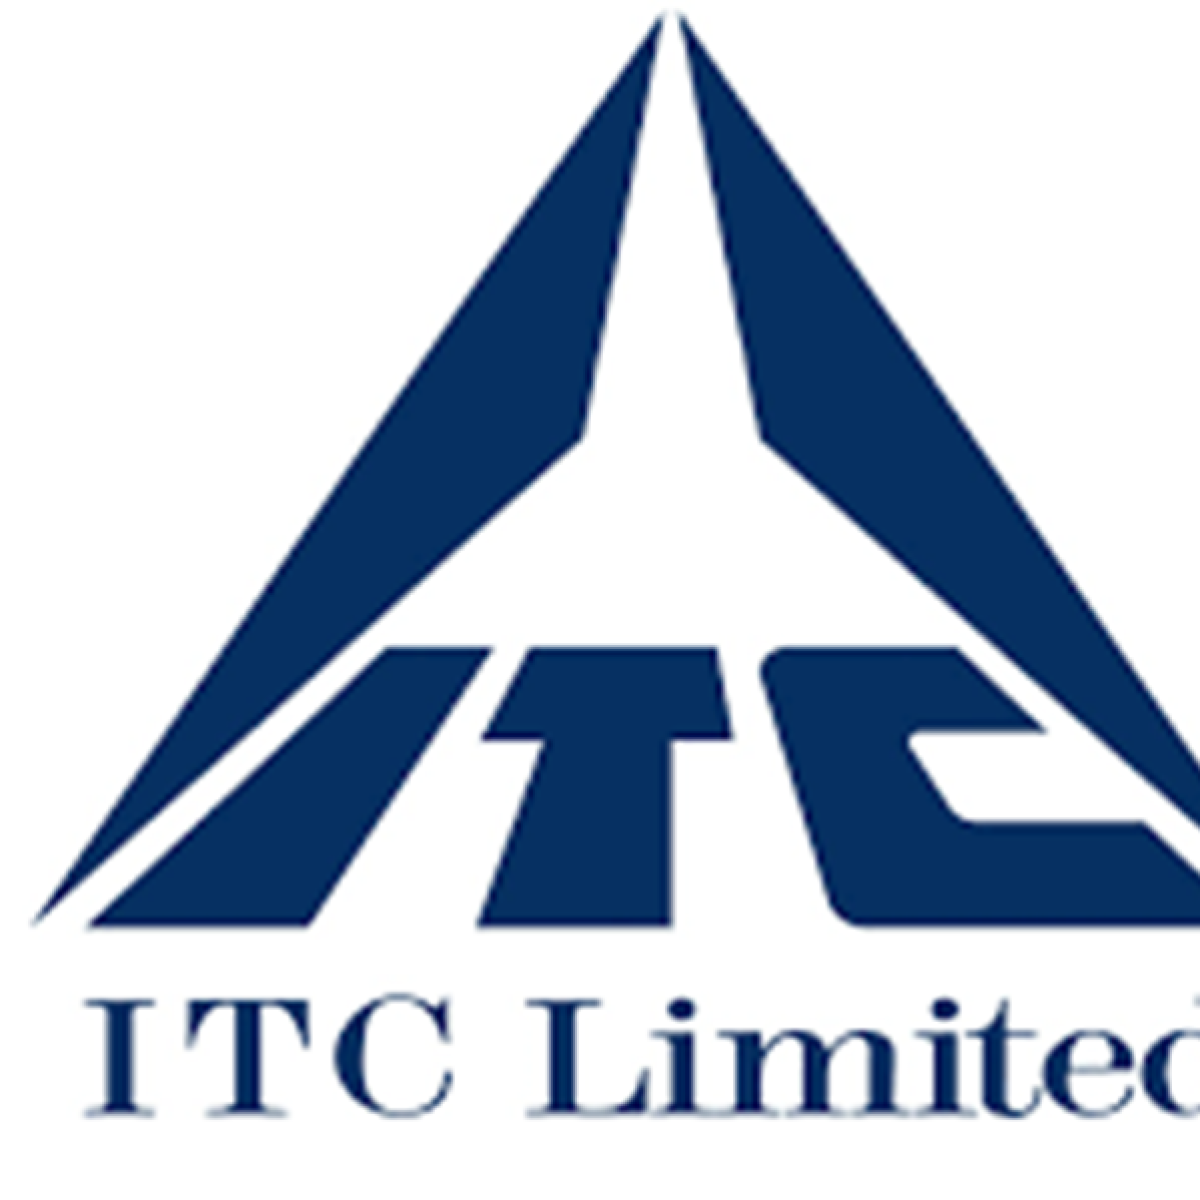 ITC Q2 net profit up 37%